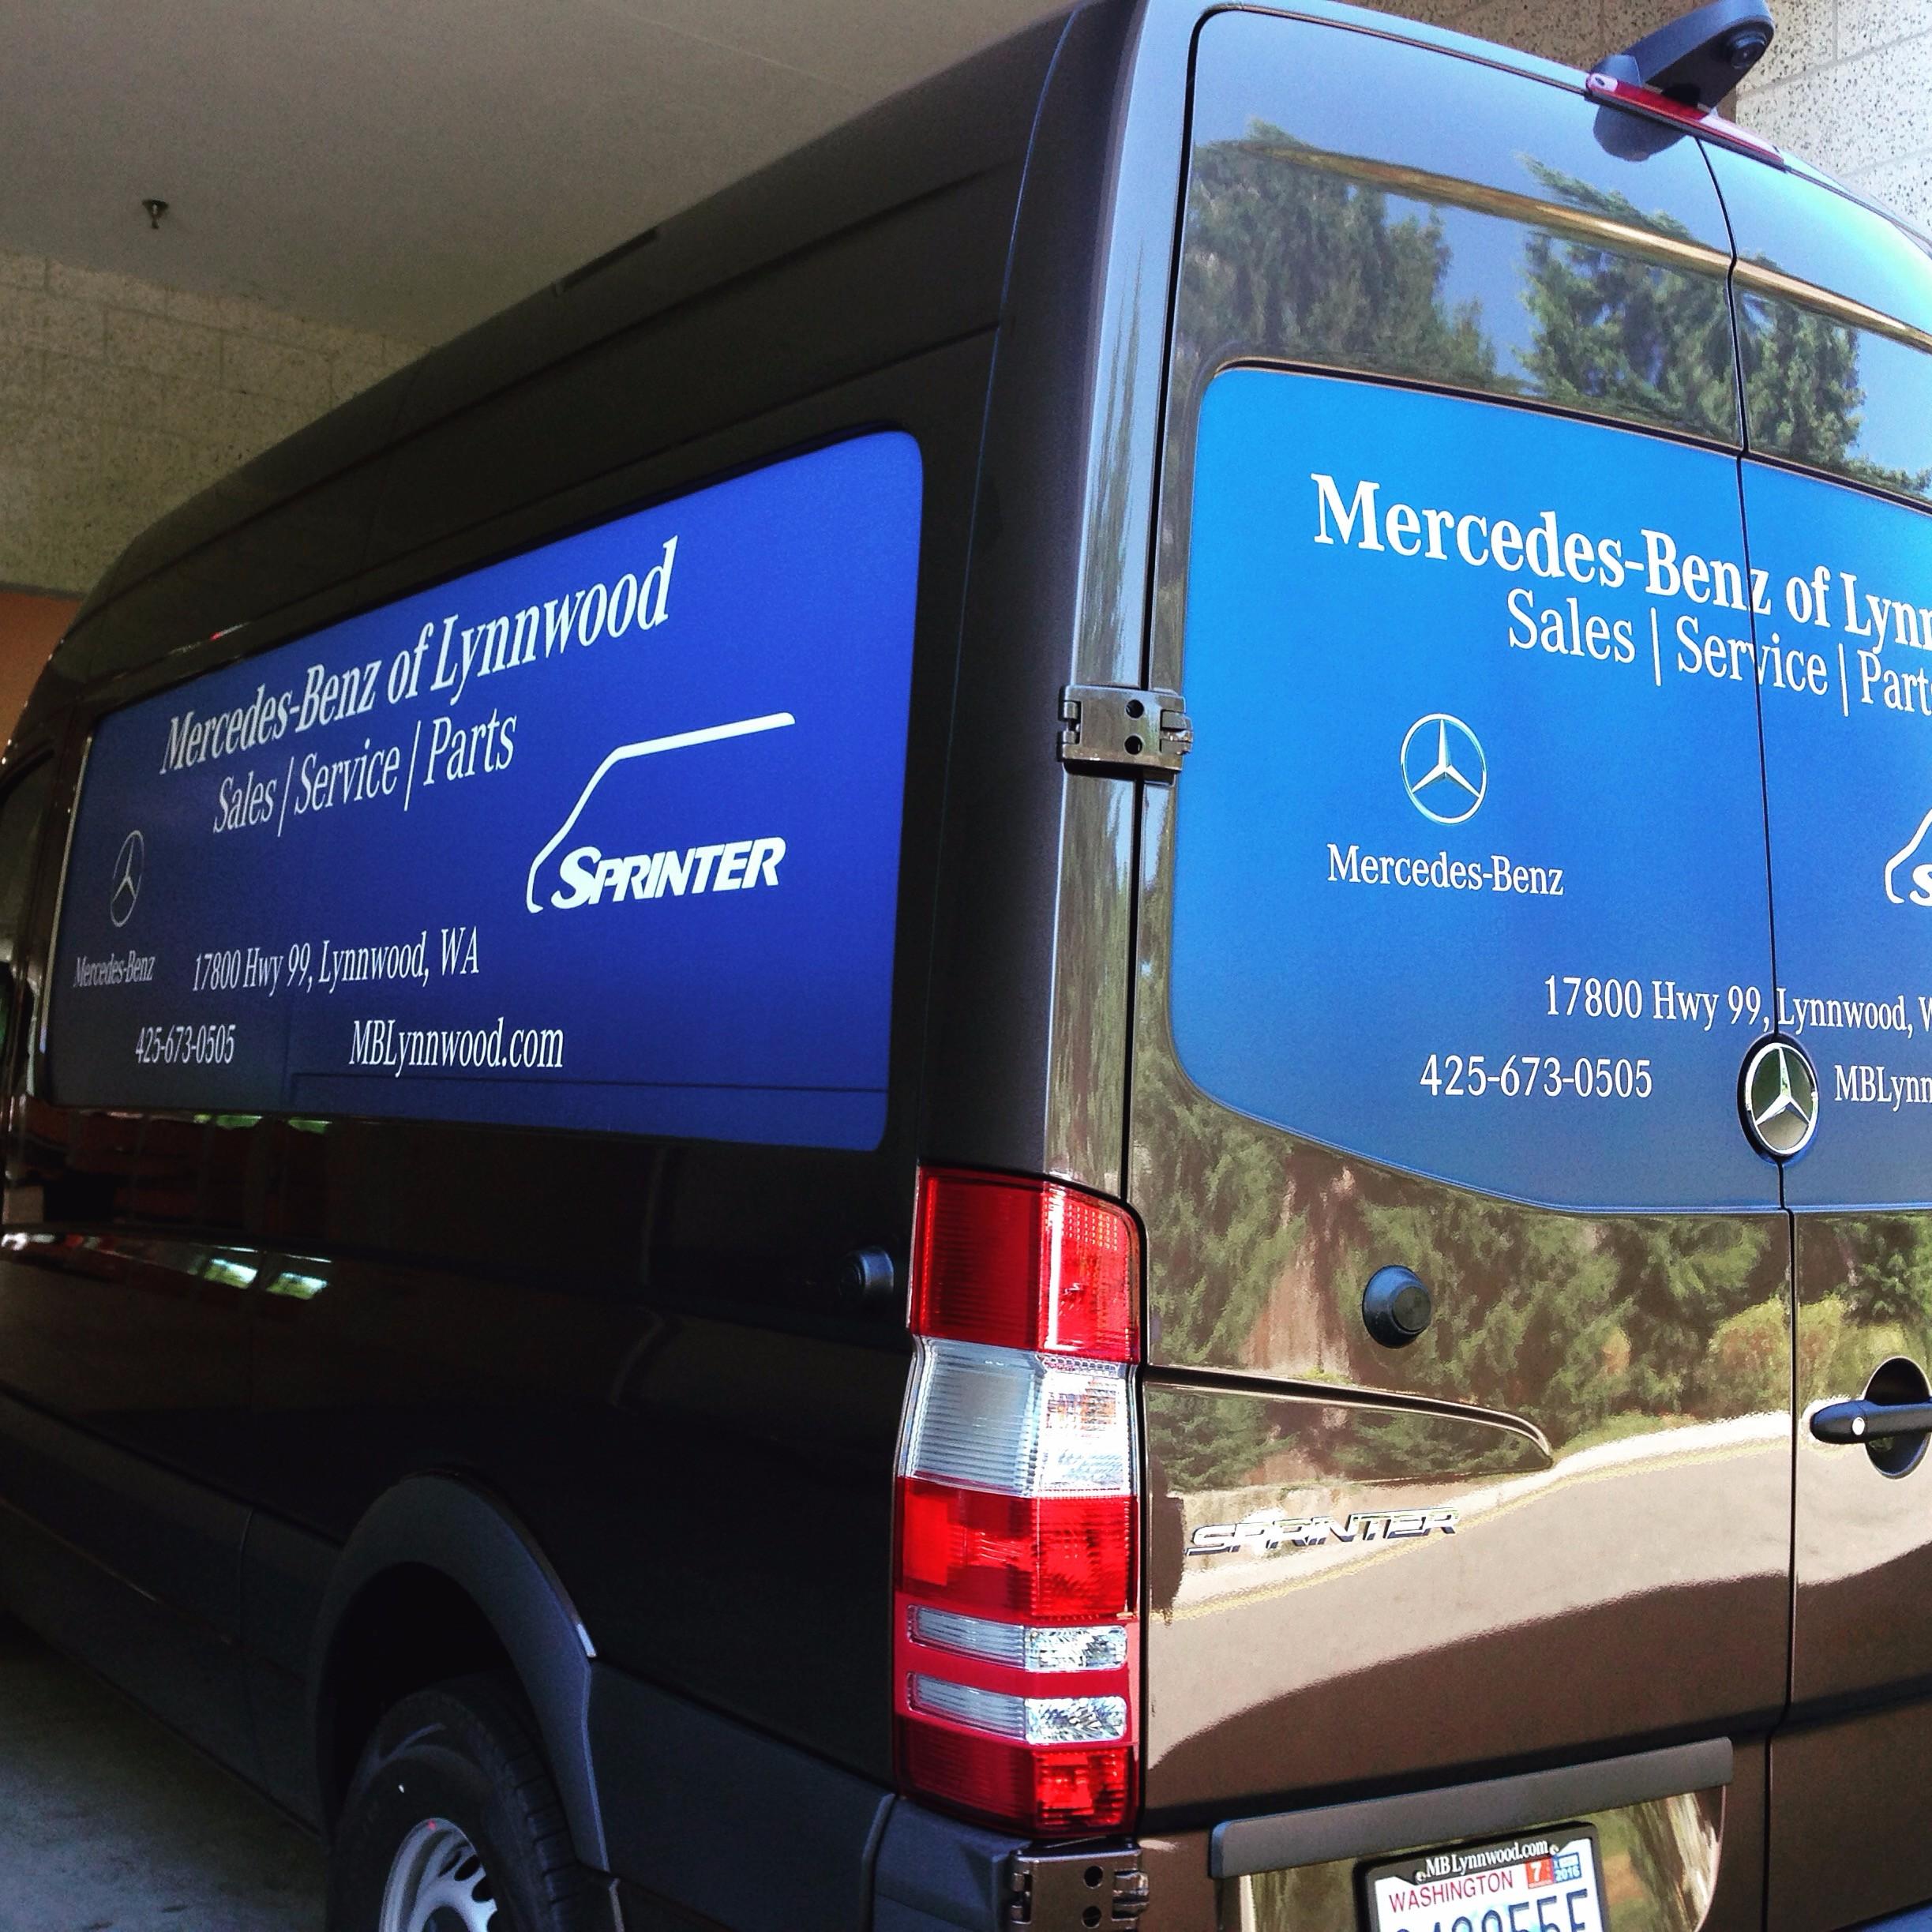 Vinyl Van Wrap For Mercedes Benz Of Lynnwood